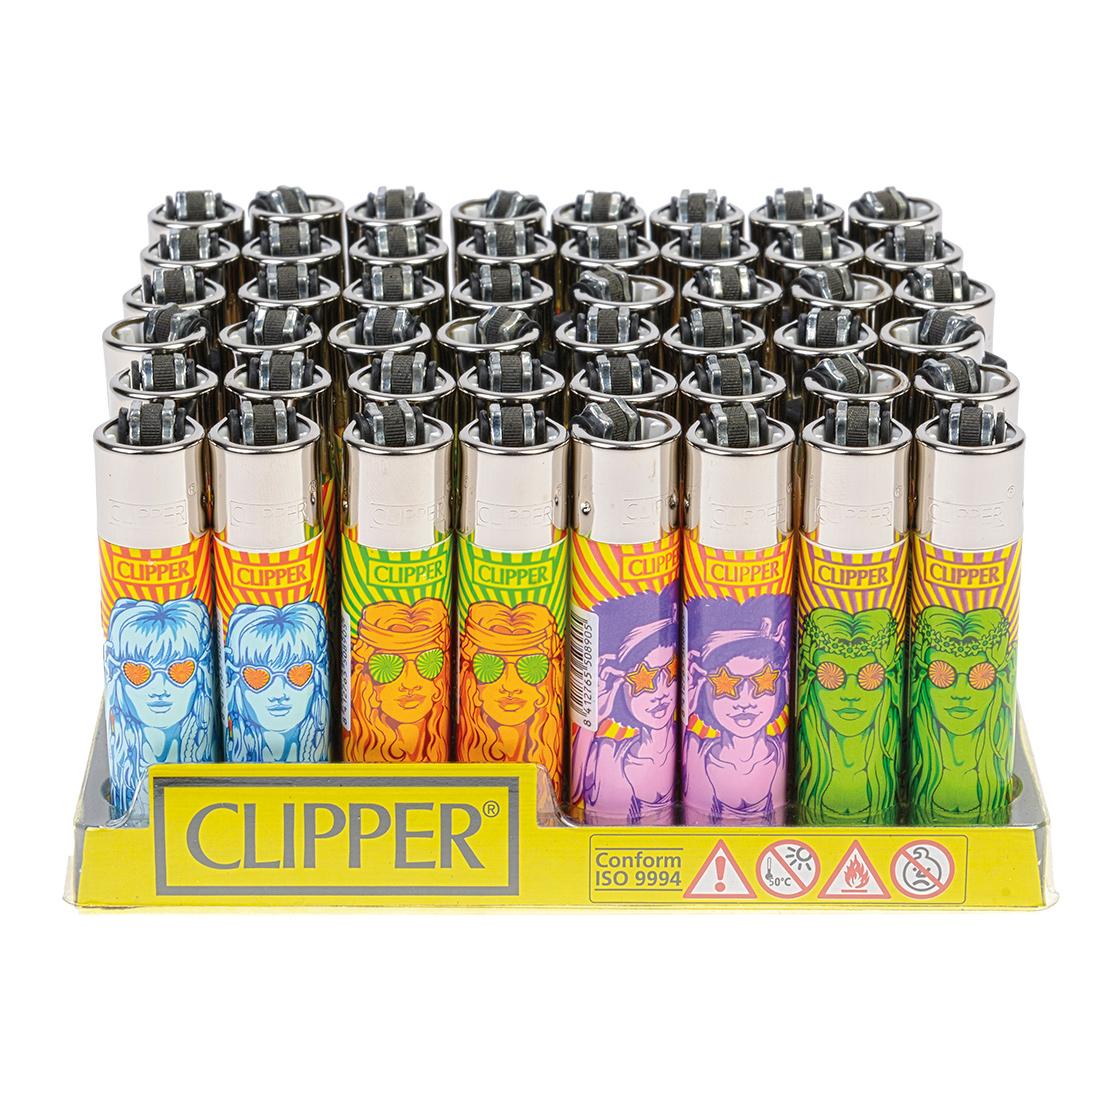 briquet Clipper hippie girl